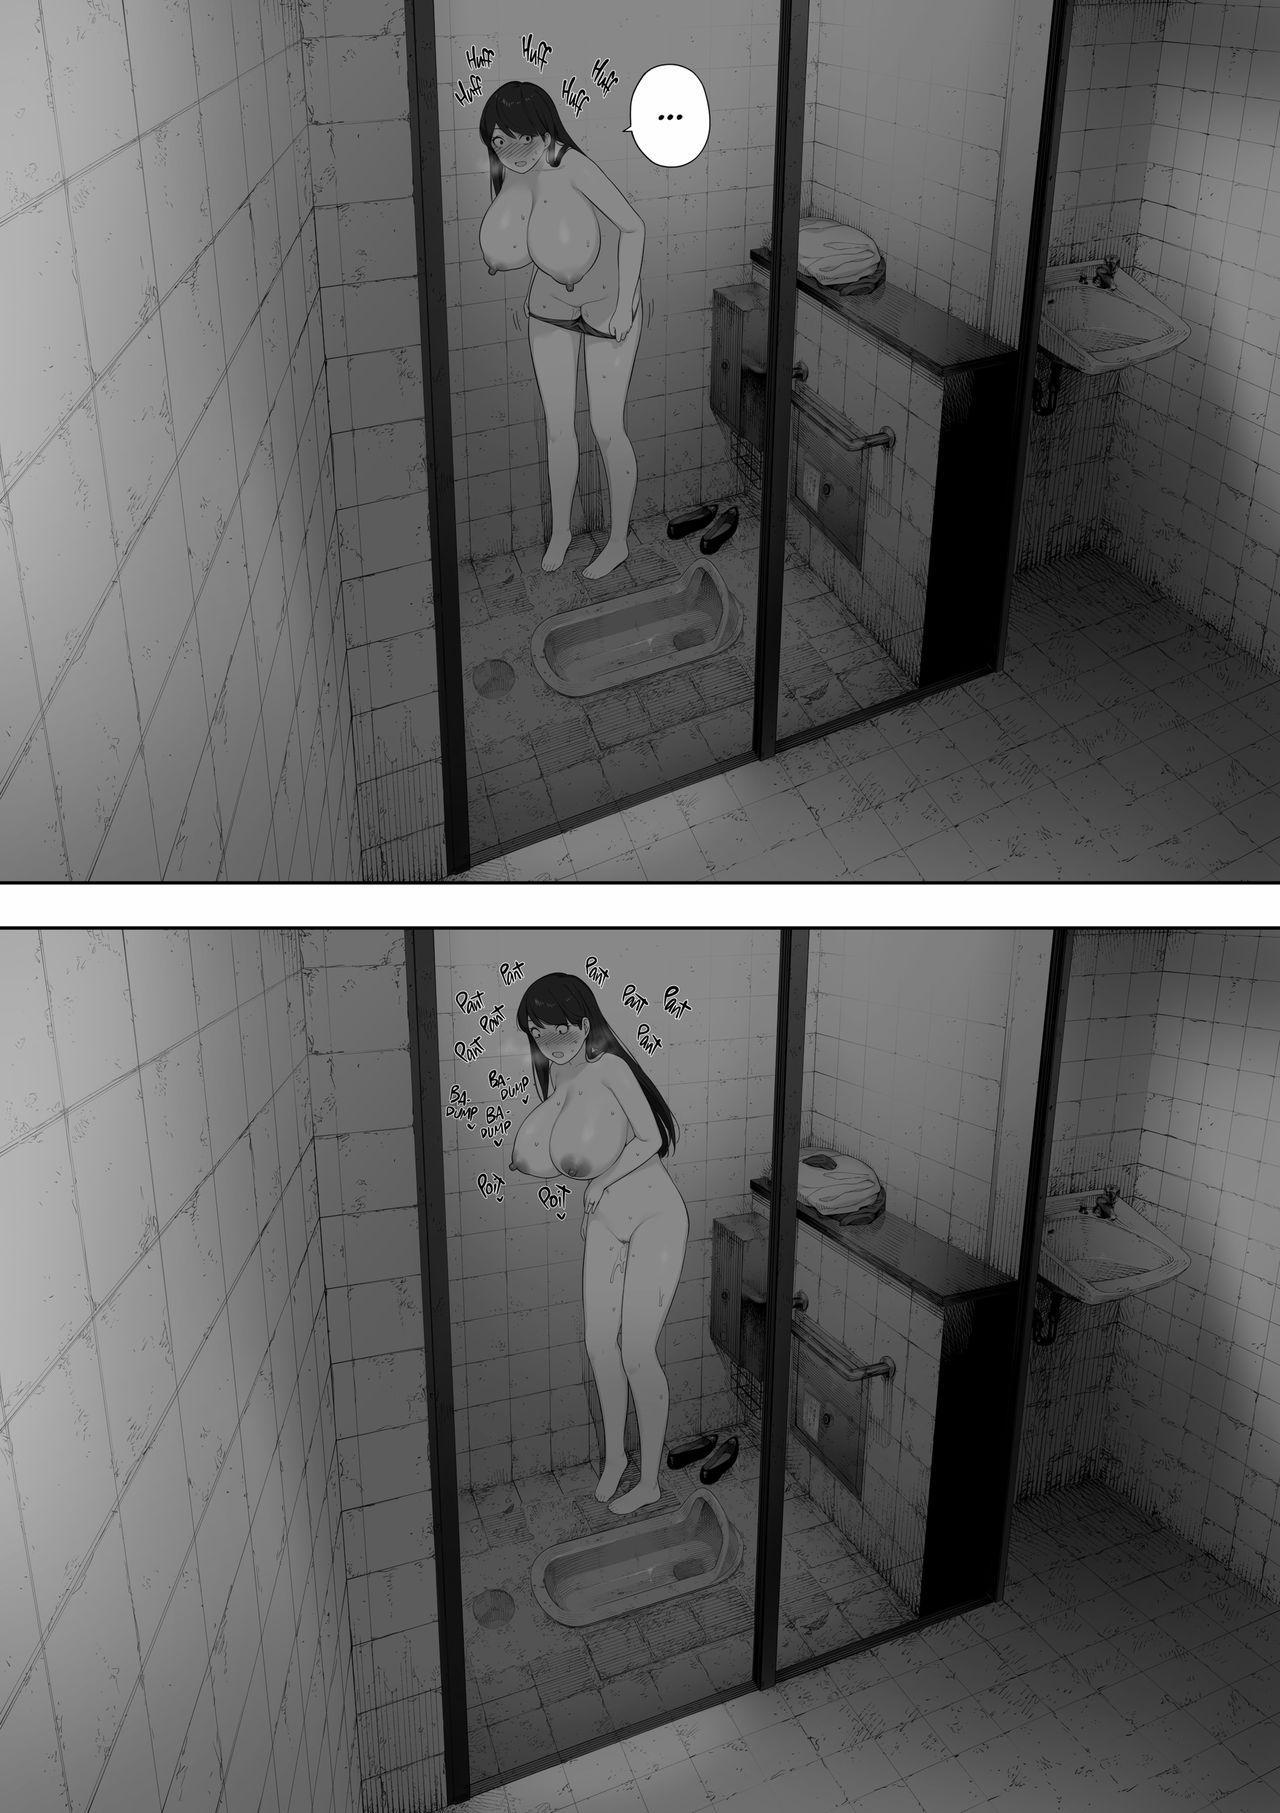 [NT Labo (NT Robo)] Aisai, Doui no Ue, Netorare Roshutsu | [NT Labo(NT Robo)] Cucked With_My Consent My Exhibitionist Wife [English] 9